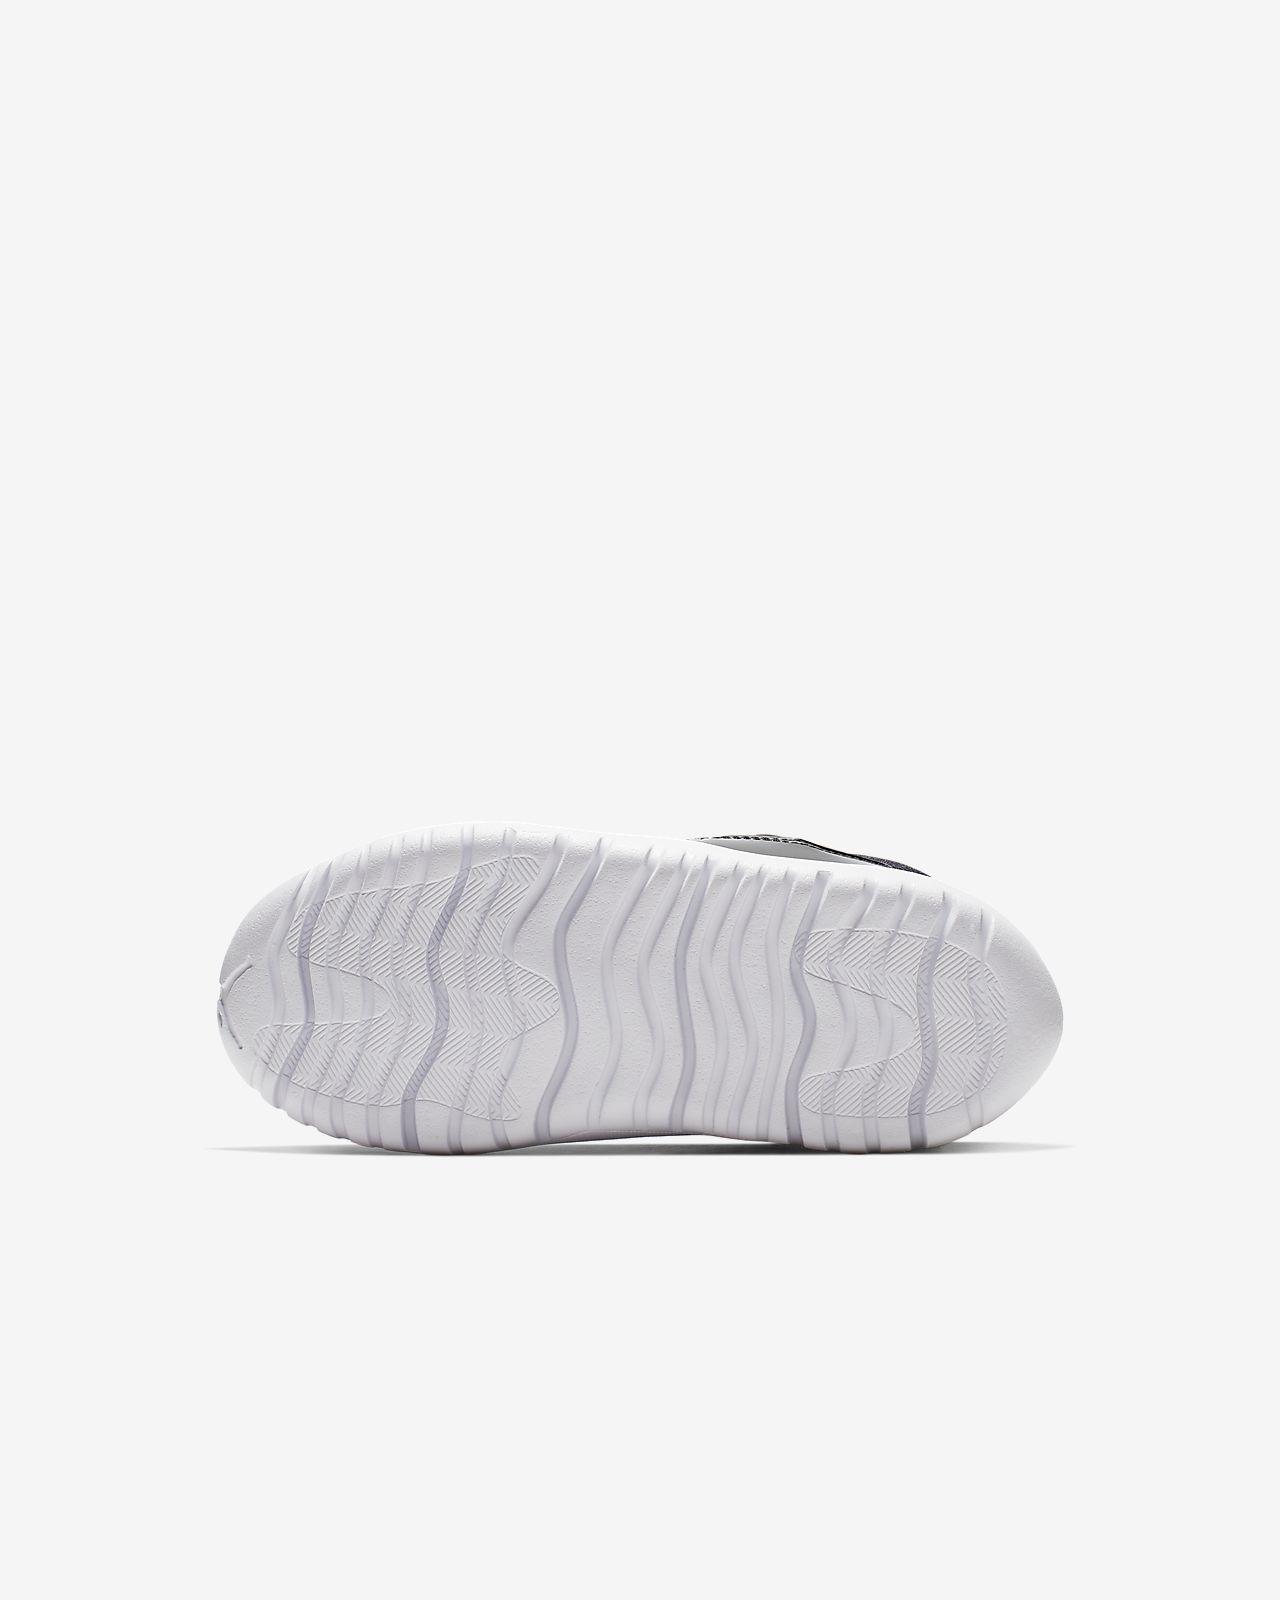 44d9cf850fe4 Jordan 11 Retro Little Flex Little Kids  Shoe. Nike.com